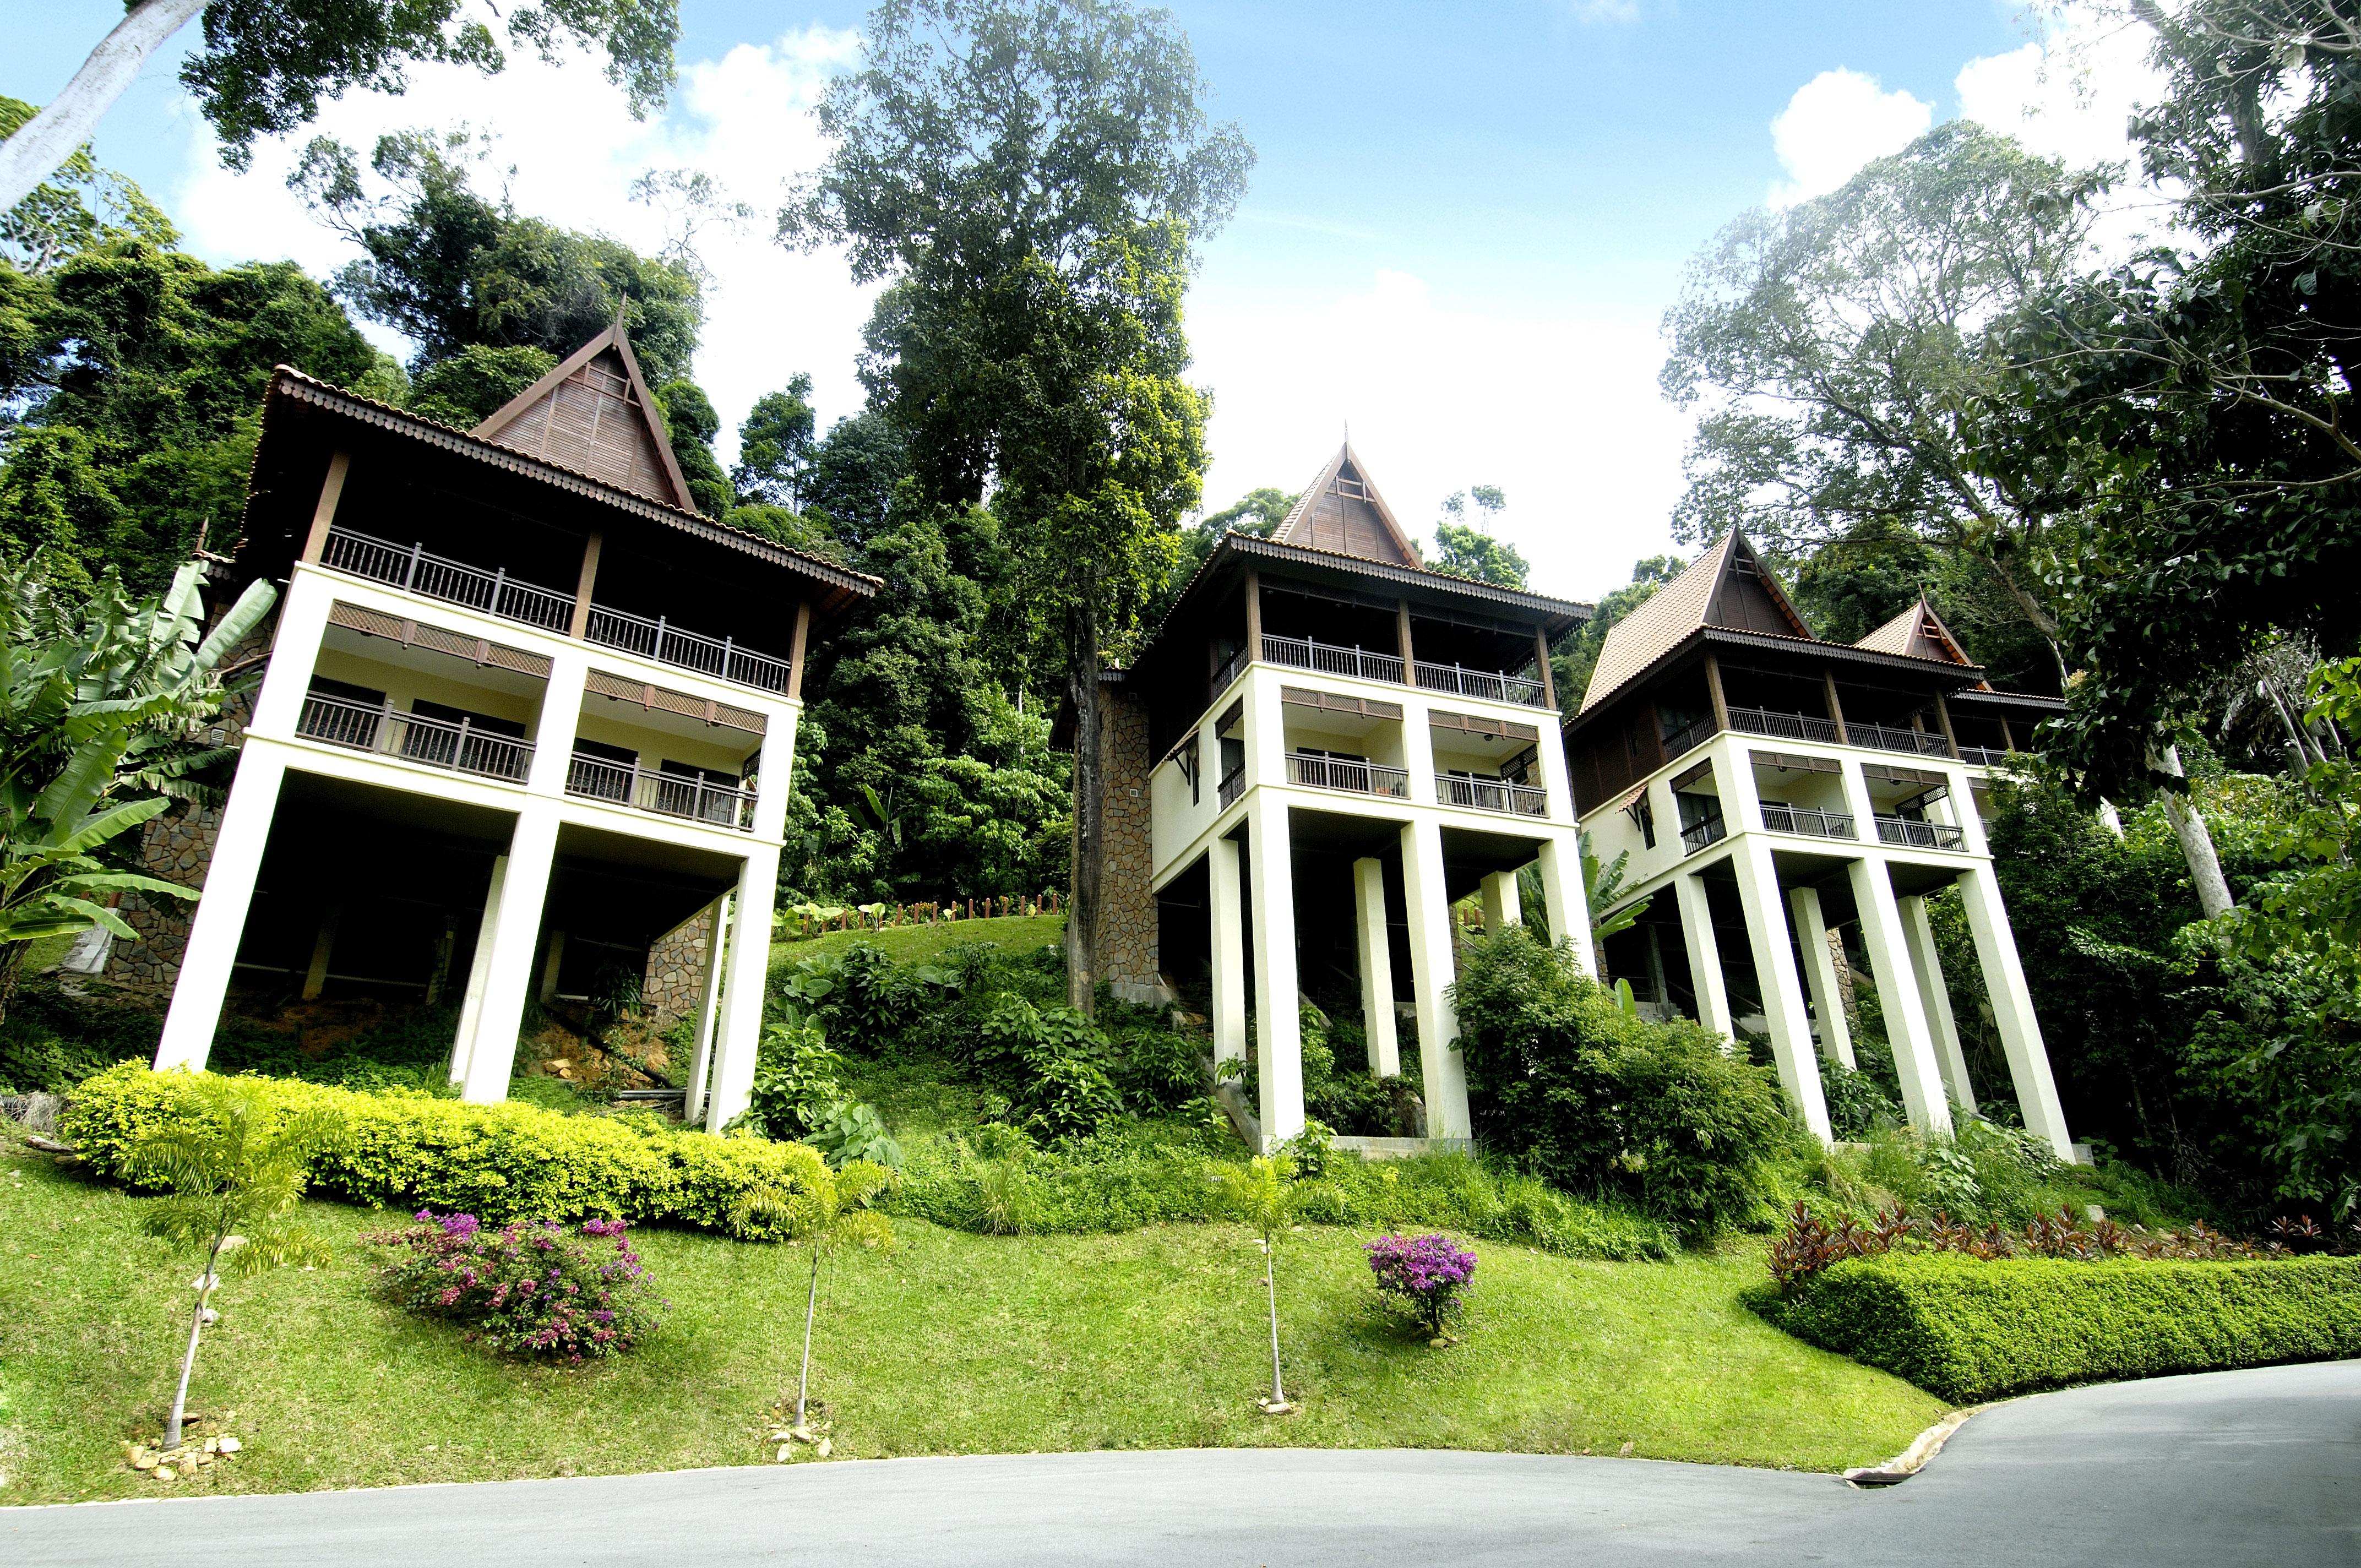 Berjaya-Langkawi-Resort-Premier Chalet - Facade